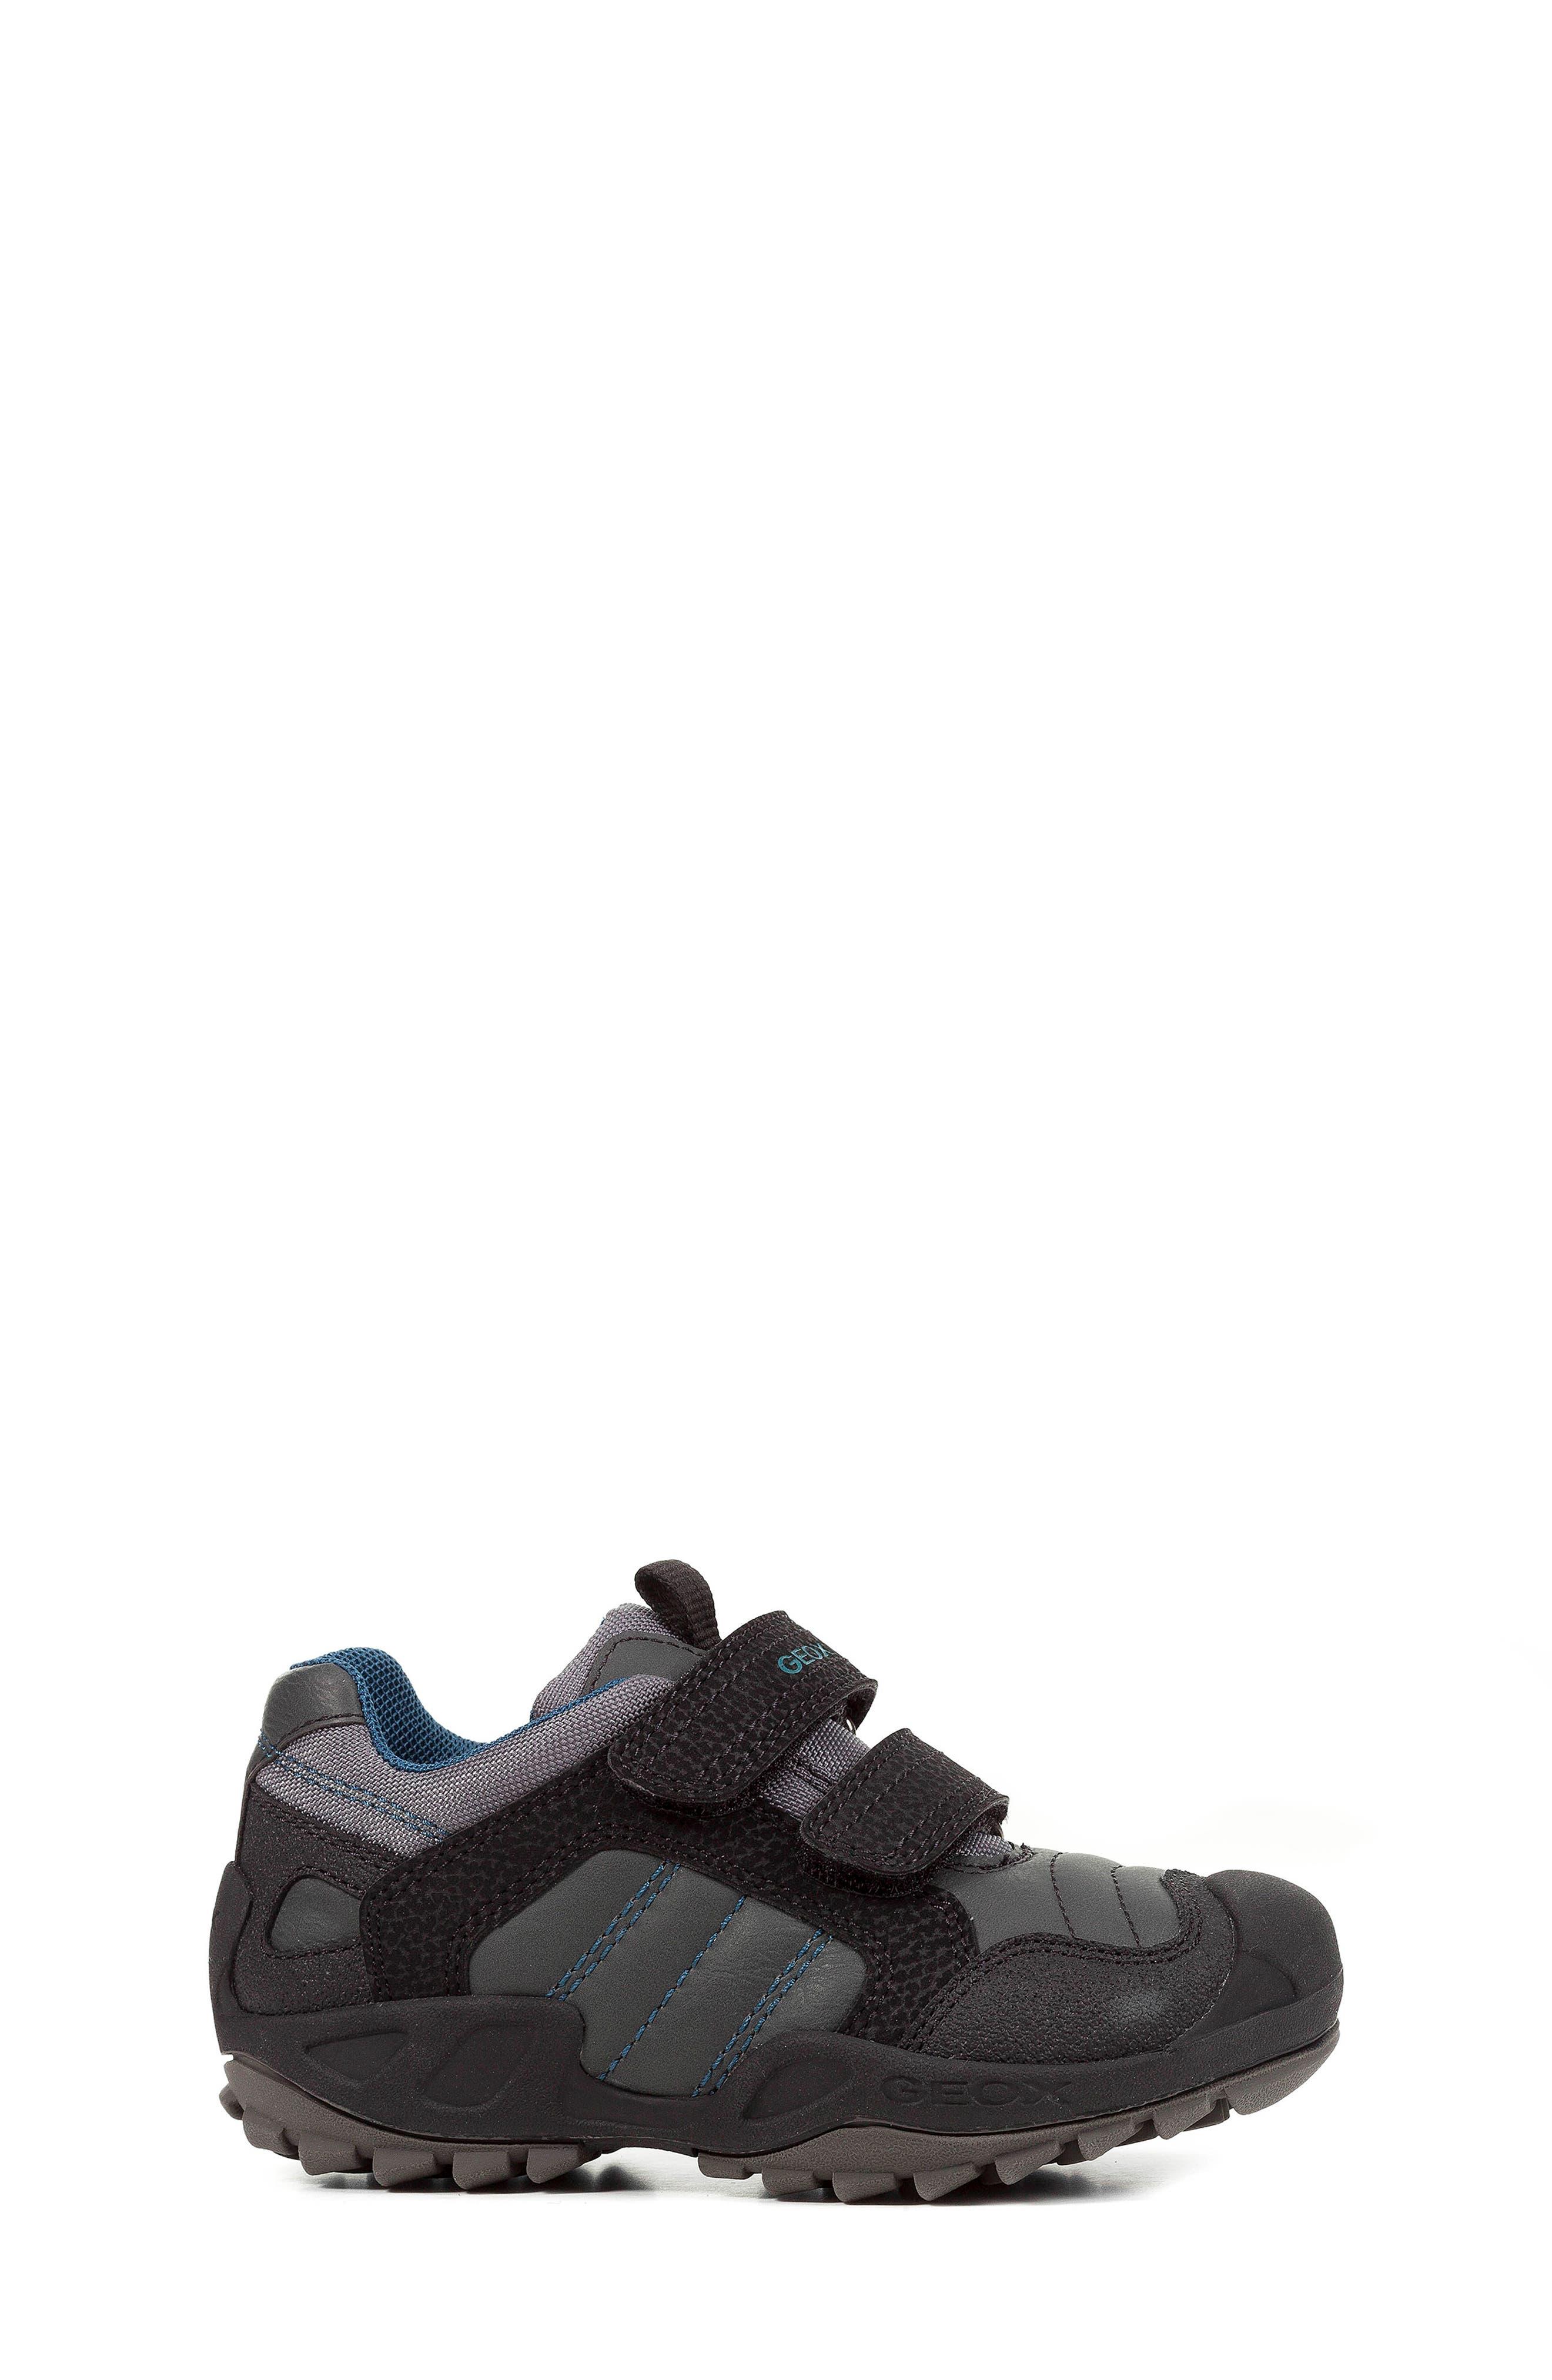 New Savage Sneaker,                             Alternate thumbnail 3, color,                             DARK GREY/PETROL